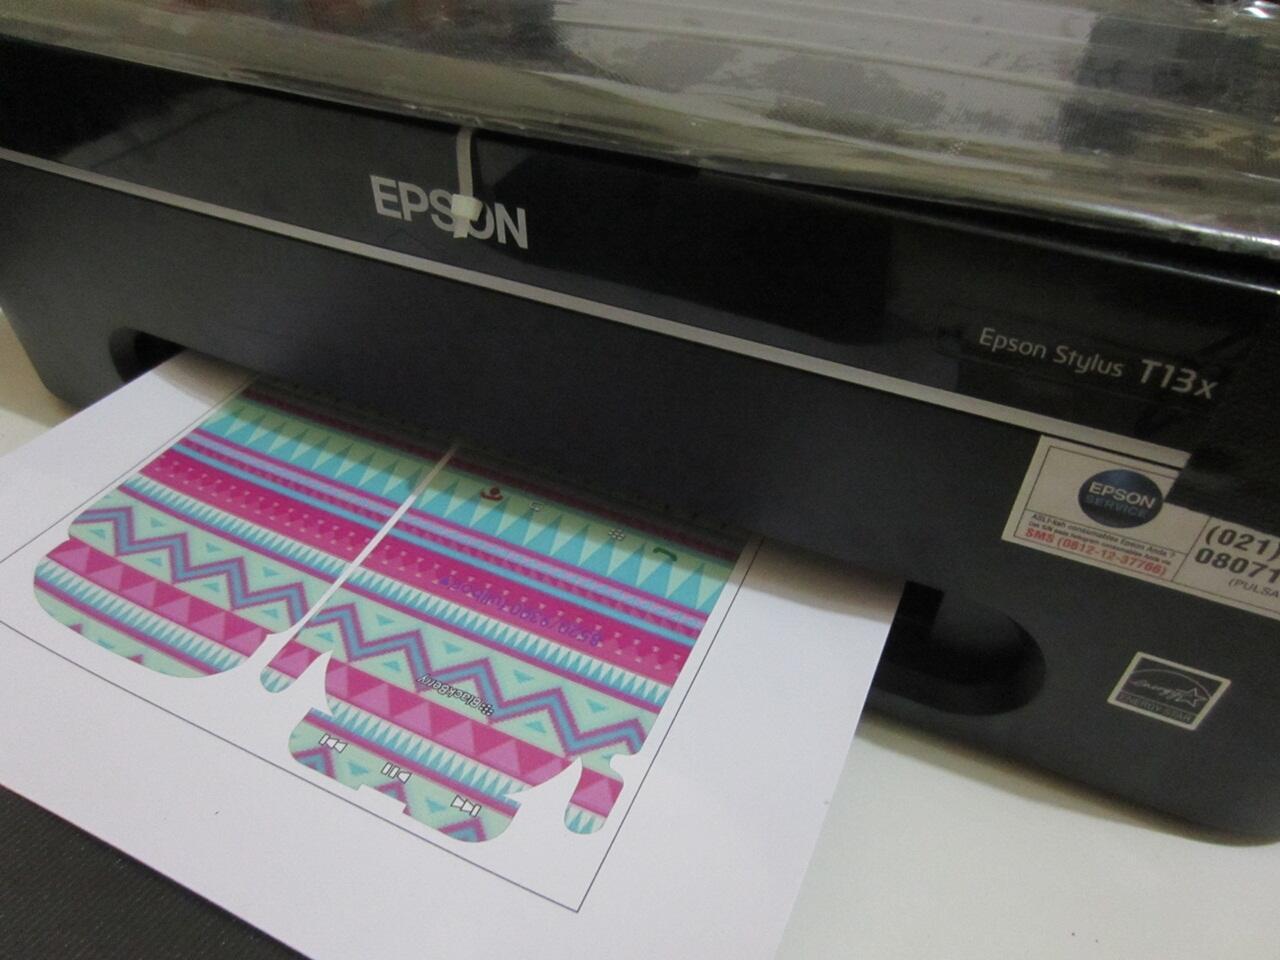 Sticker vinyl bahan garskin bisa print dengan printer inkjet